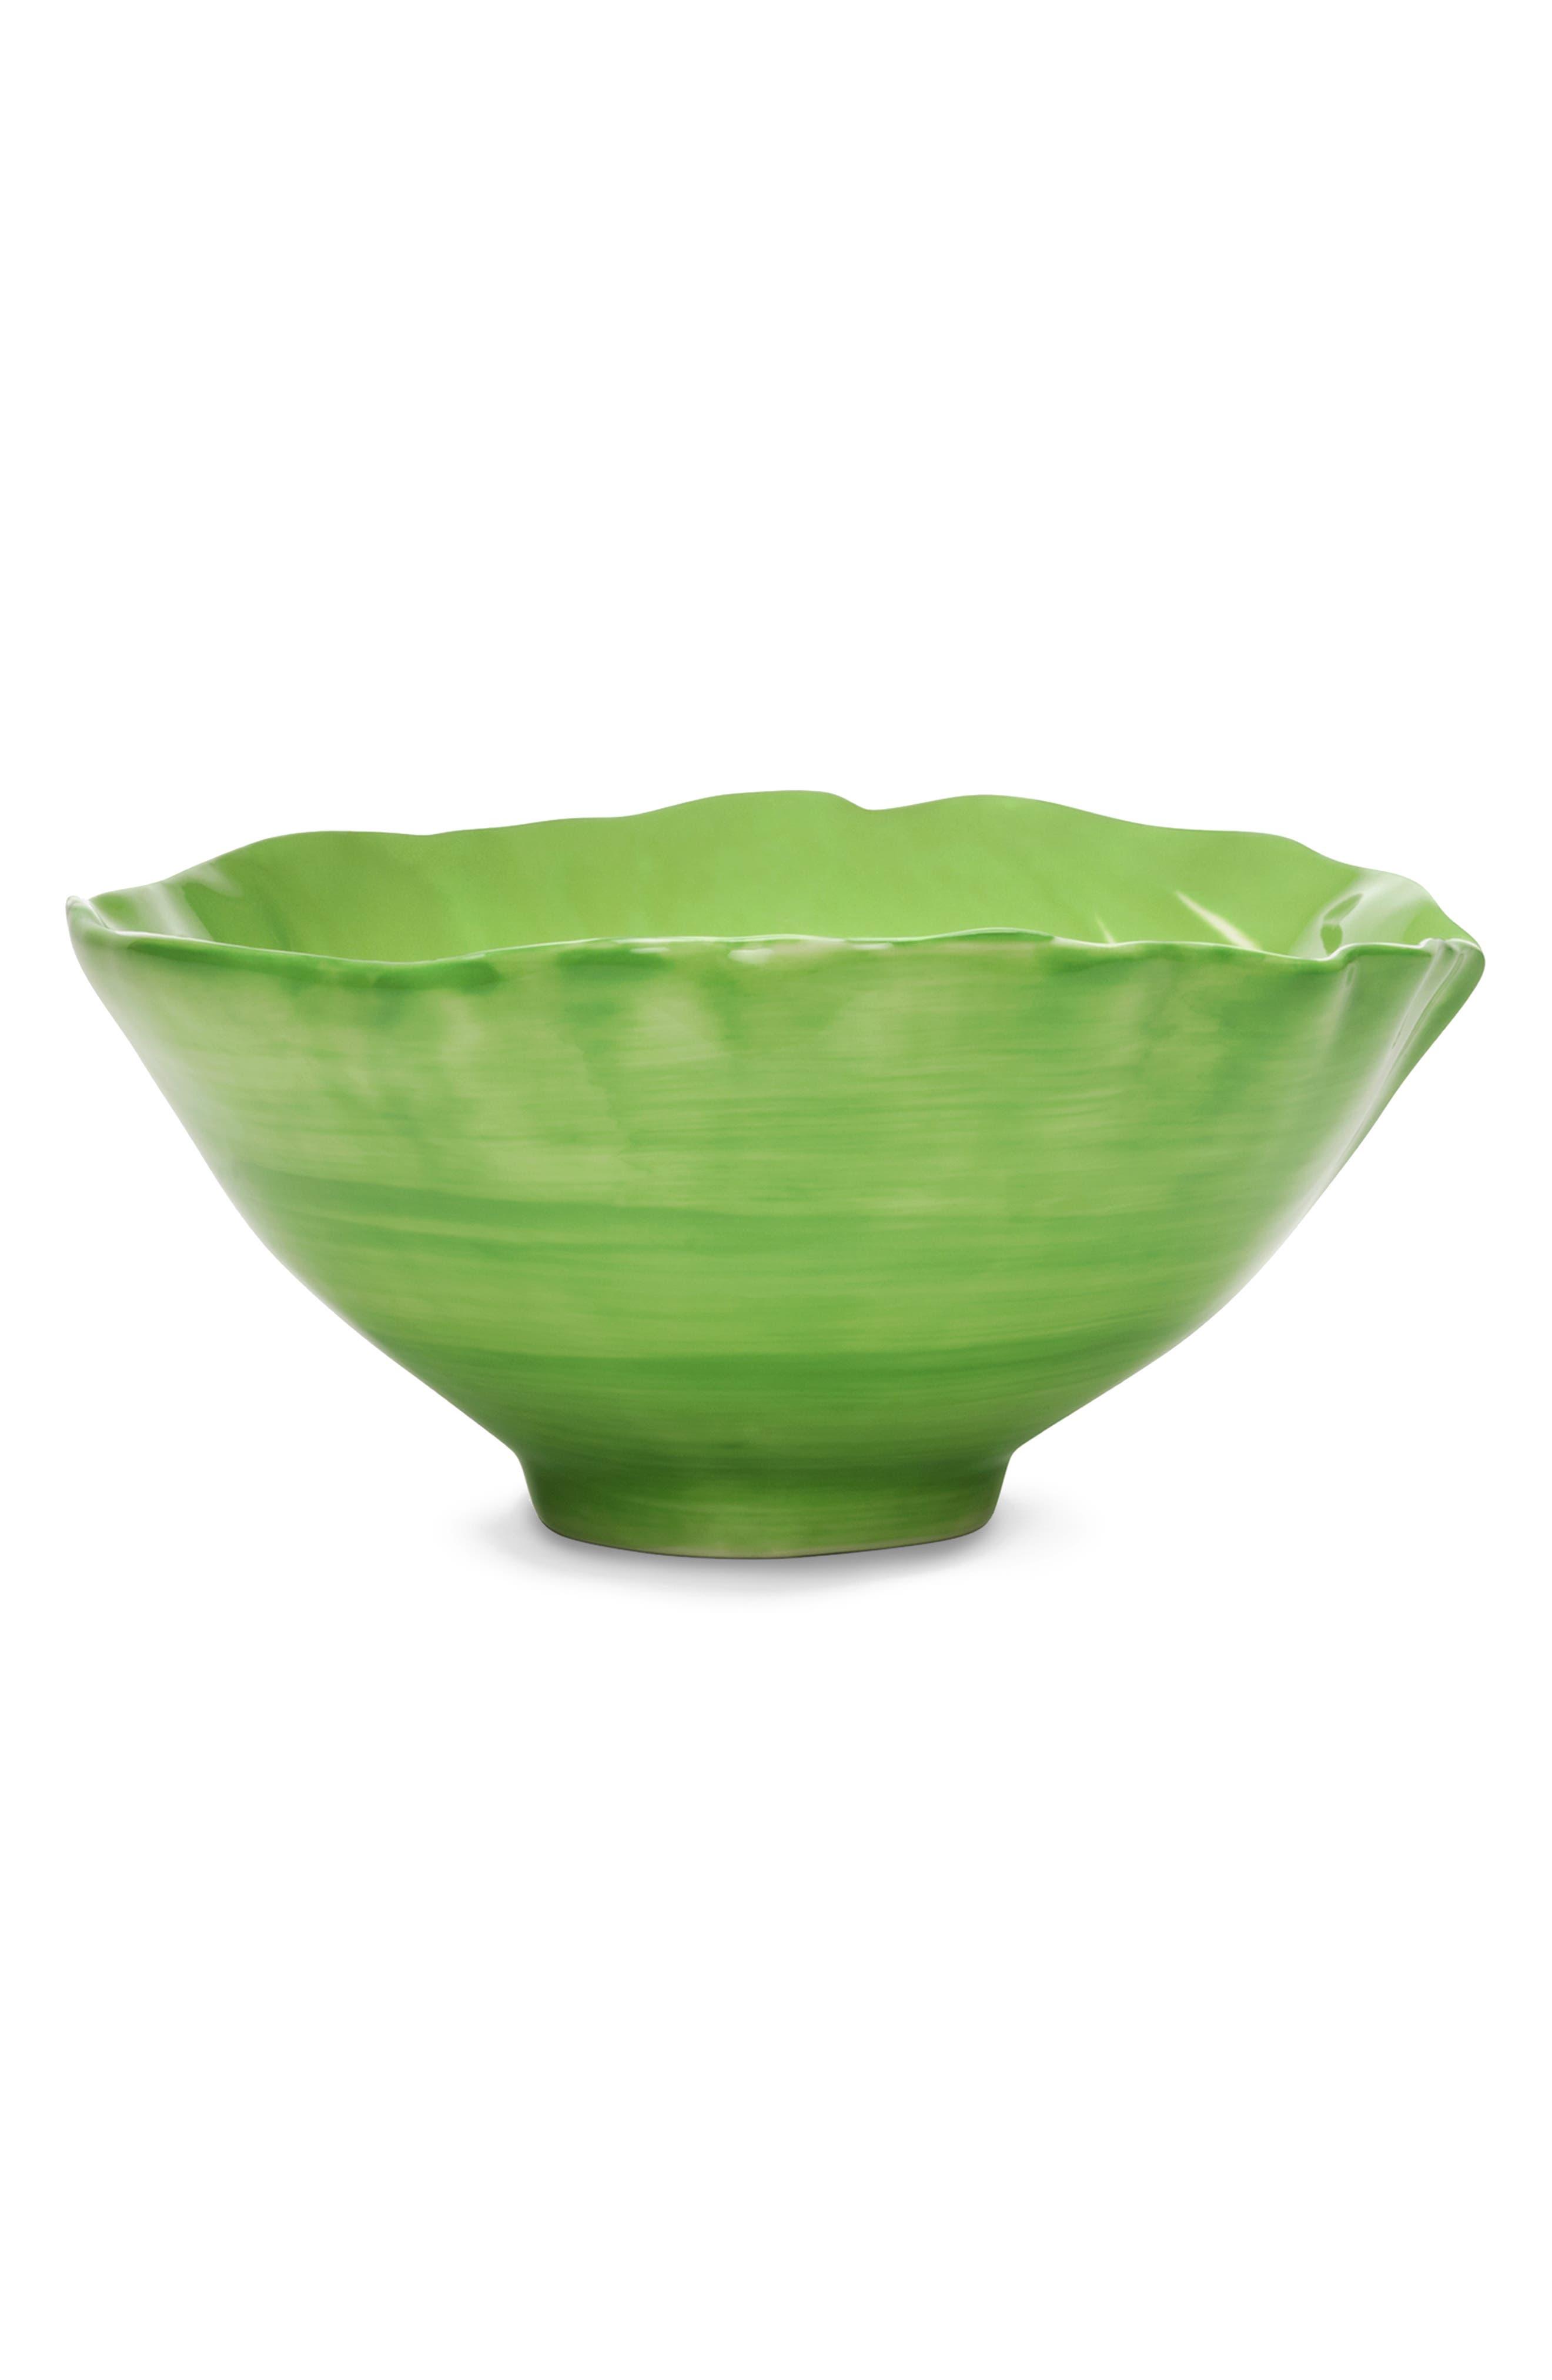 TORY BURCH,                             Set of 4 Lettuce Ware Soup Bowls,                             Alternate thumbnail 2, color,                             GREEN